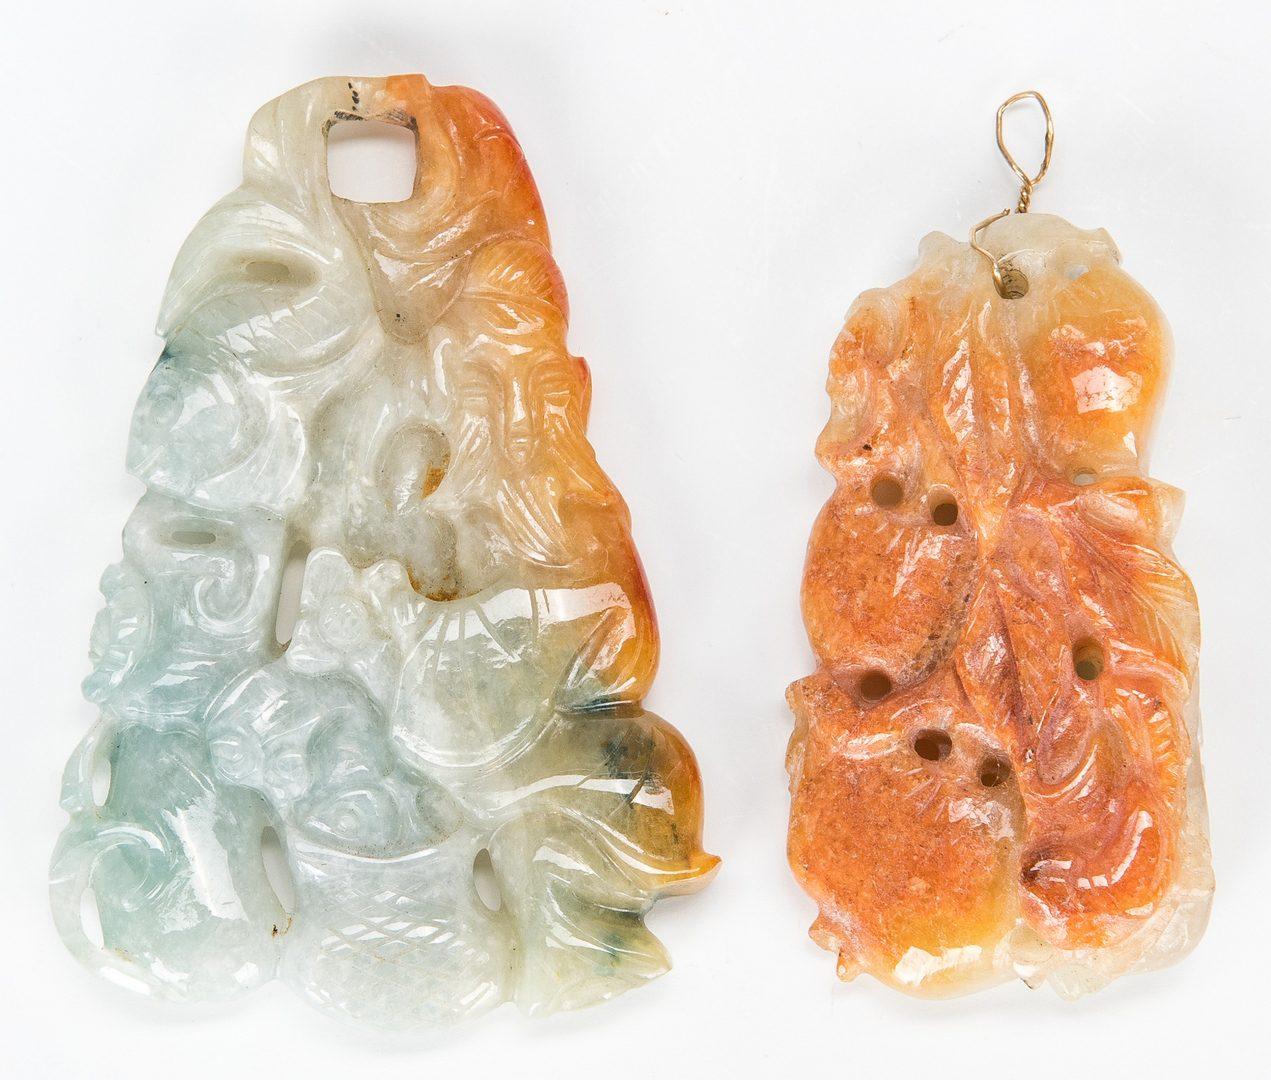 Lot 33: 6 Asian Decorative Items, incl. Thangka